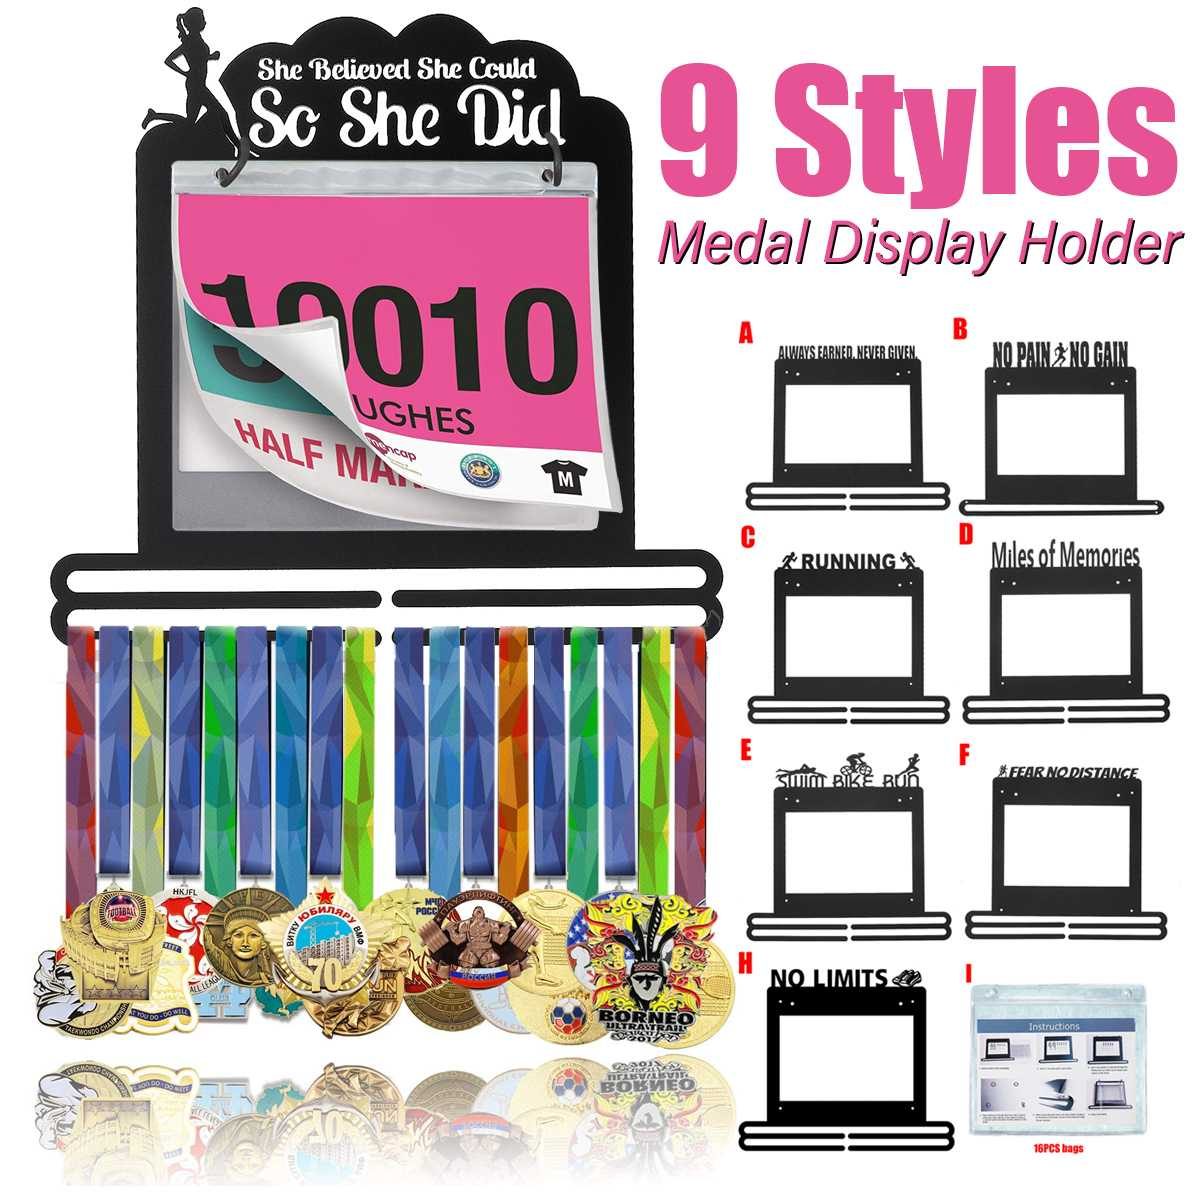 9 Styles Medal Hanger Metal Medals Holder With Race Bib Sport Medal Display Rack Wall Hang Decoration Marathon Run Swim Others